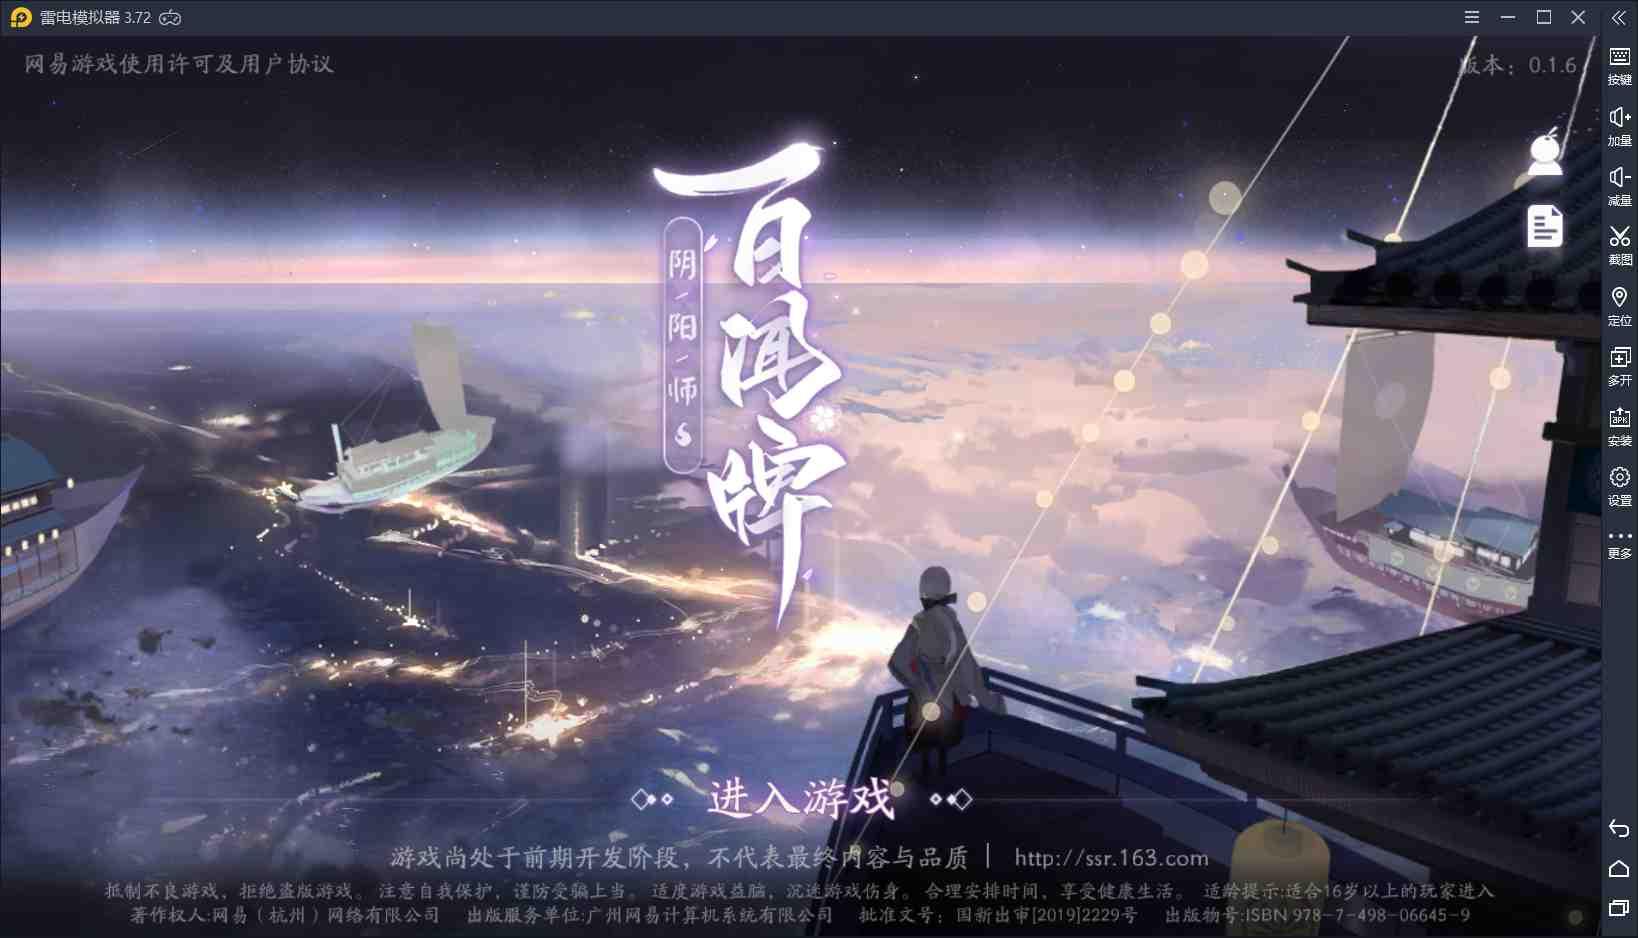 【Rai酱一周新游】《阴阳师:百闻牌》删测再开 《长安幻世绘》开启捉妖之旅